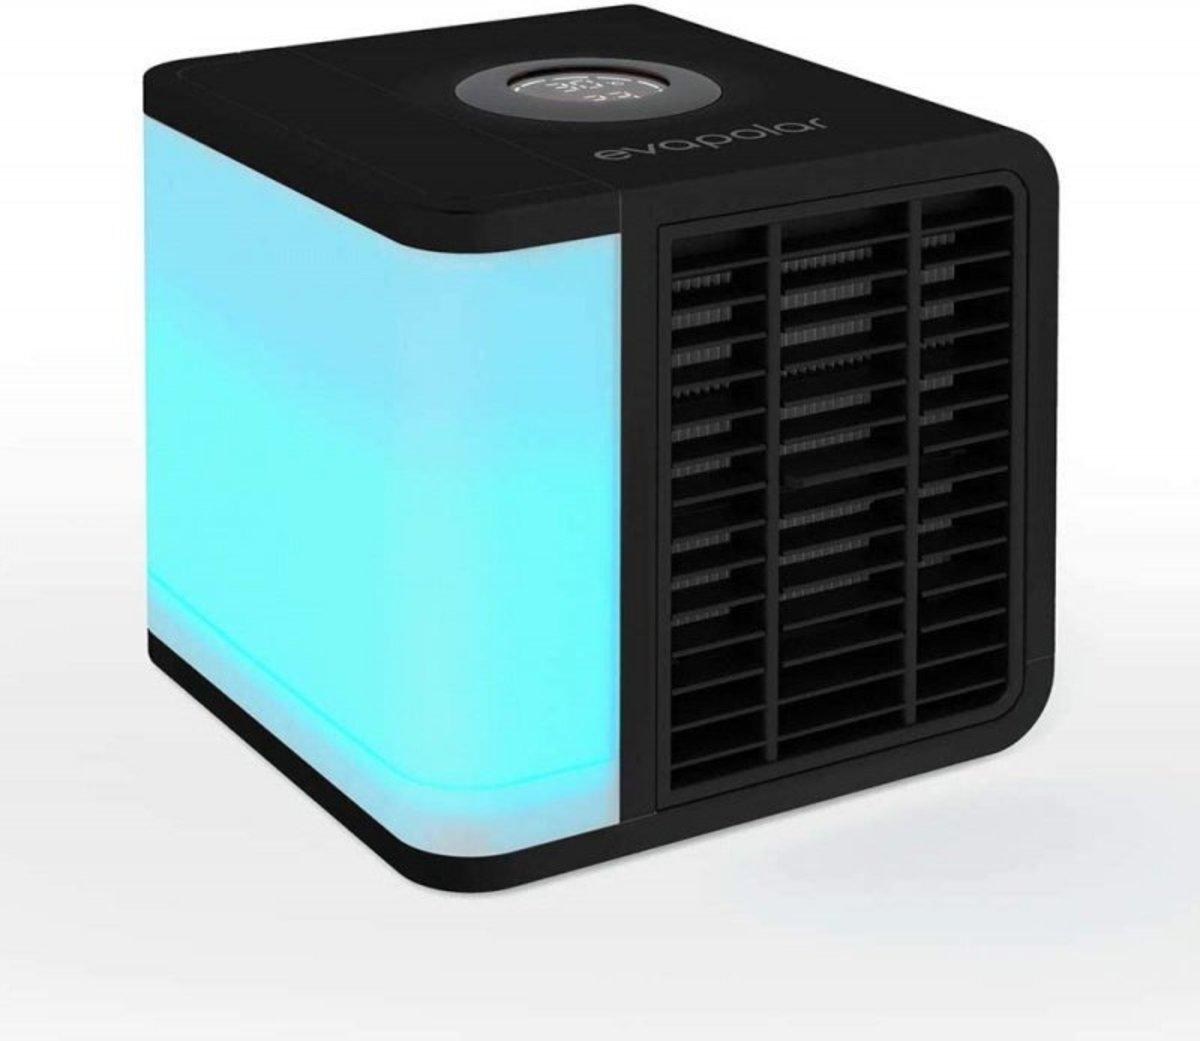 EvaLIGHT Plus EV-1500 Personal Air Conditioner Fourth Generation - Black